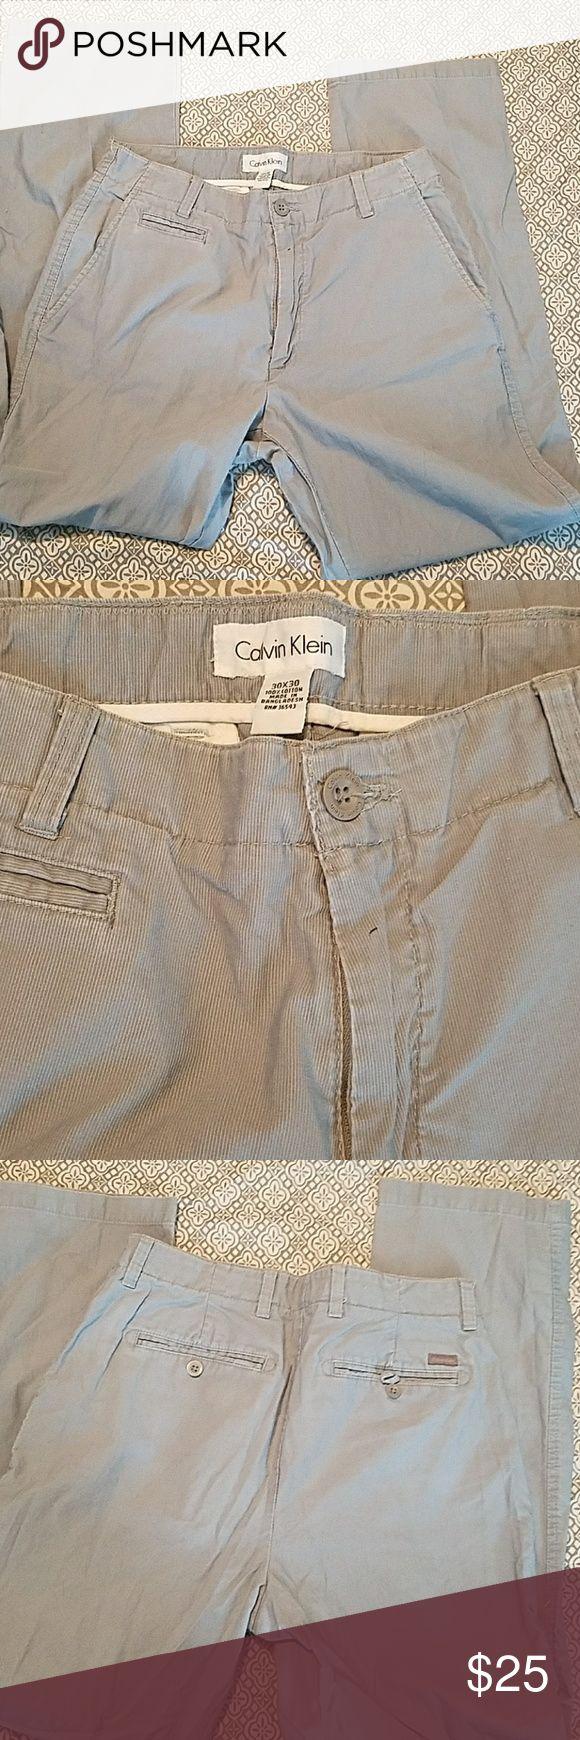 Men's corduroy Pants Like new. Hardly worn Calvin Klein Pants Corduroy